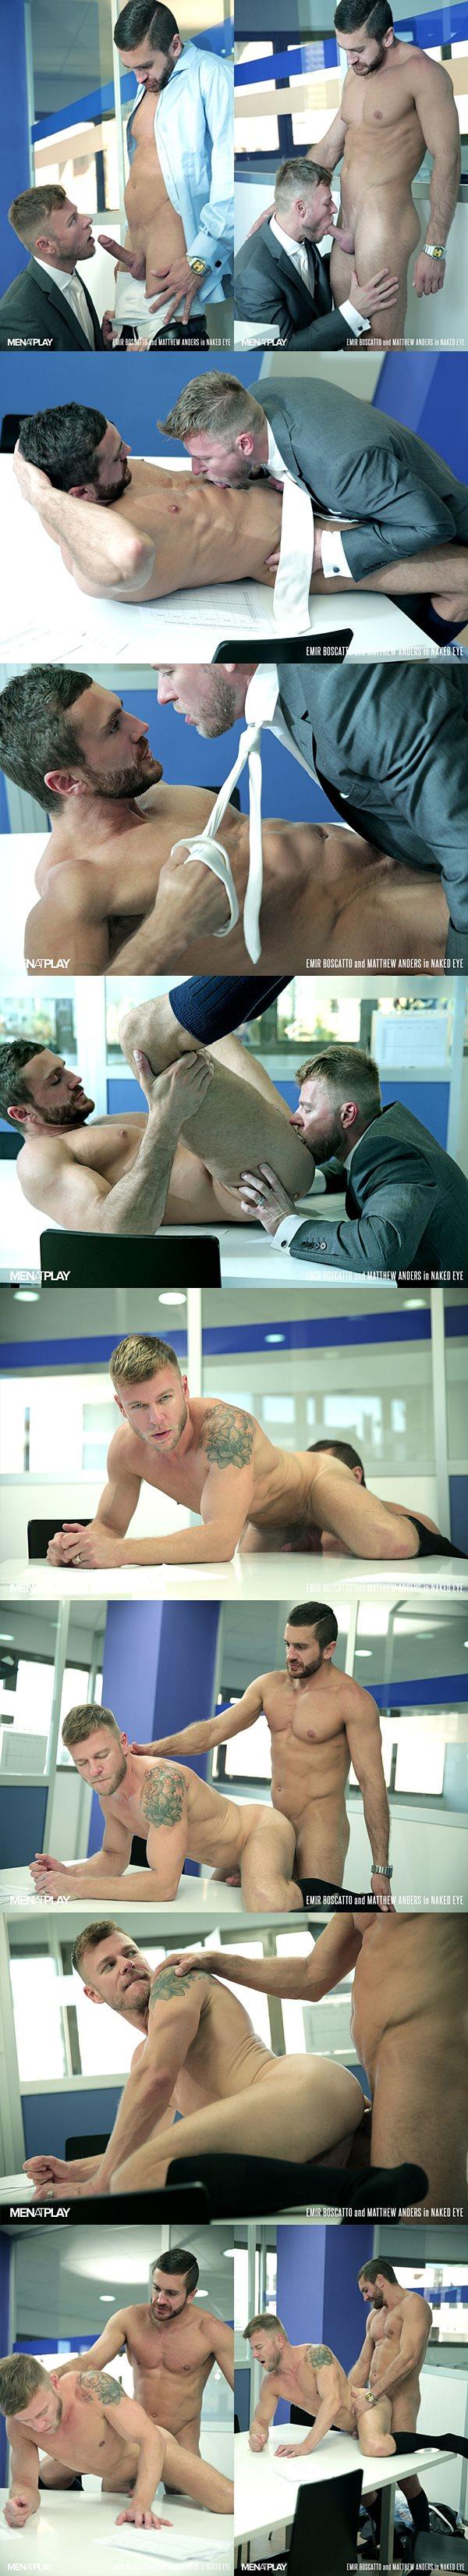 Emir Boscatto fucks Matthew Anders in Naked Eye at Menatplay